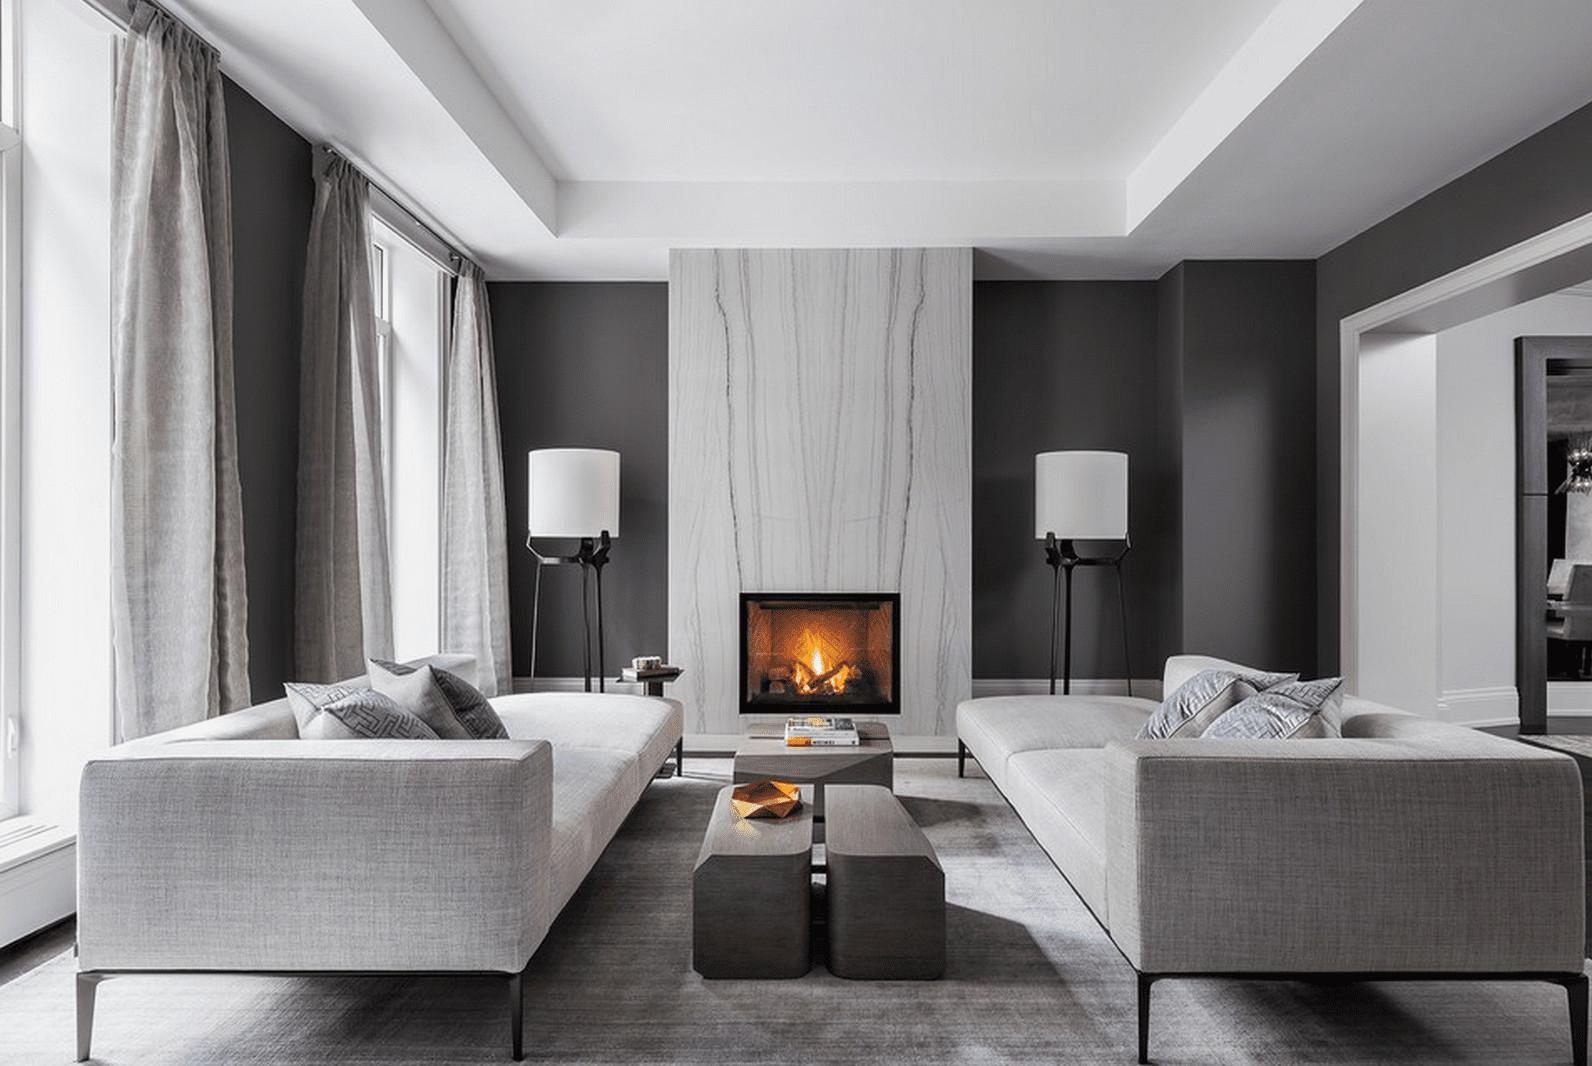 Living Room Ideas Contemporary Beautiful 21 Modern Living Room Design Ideas